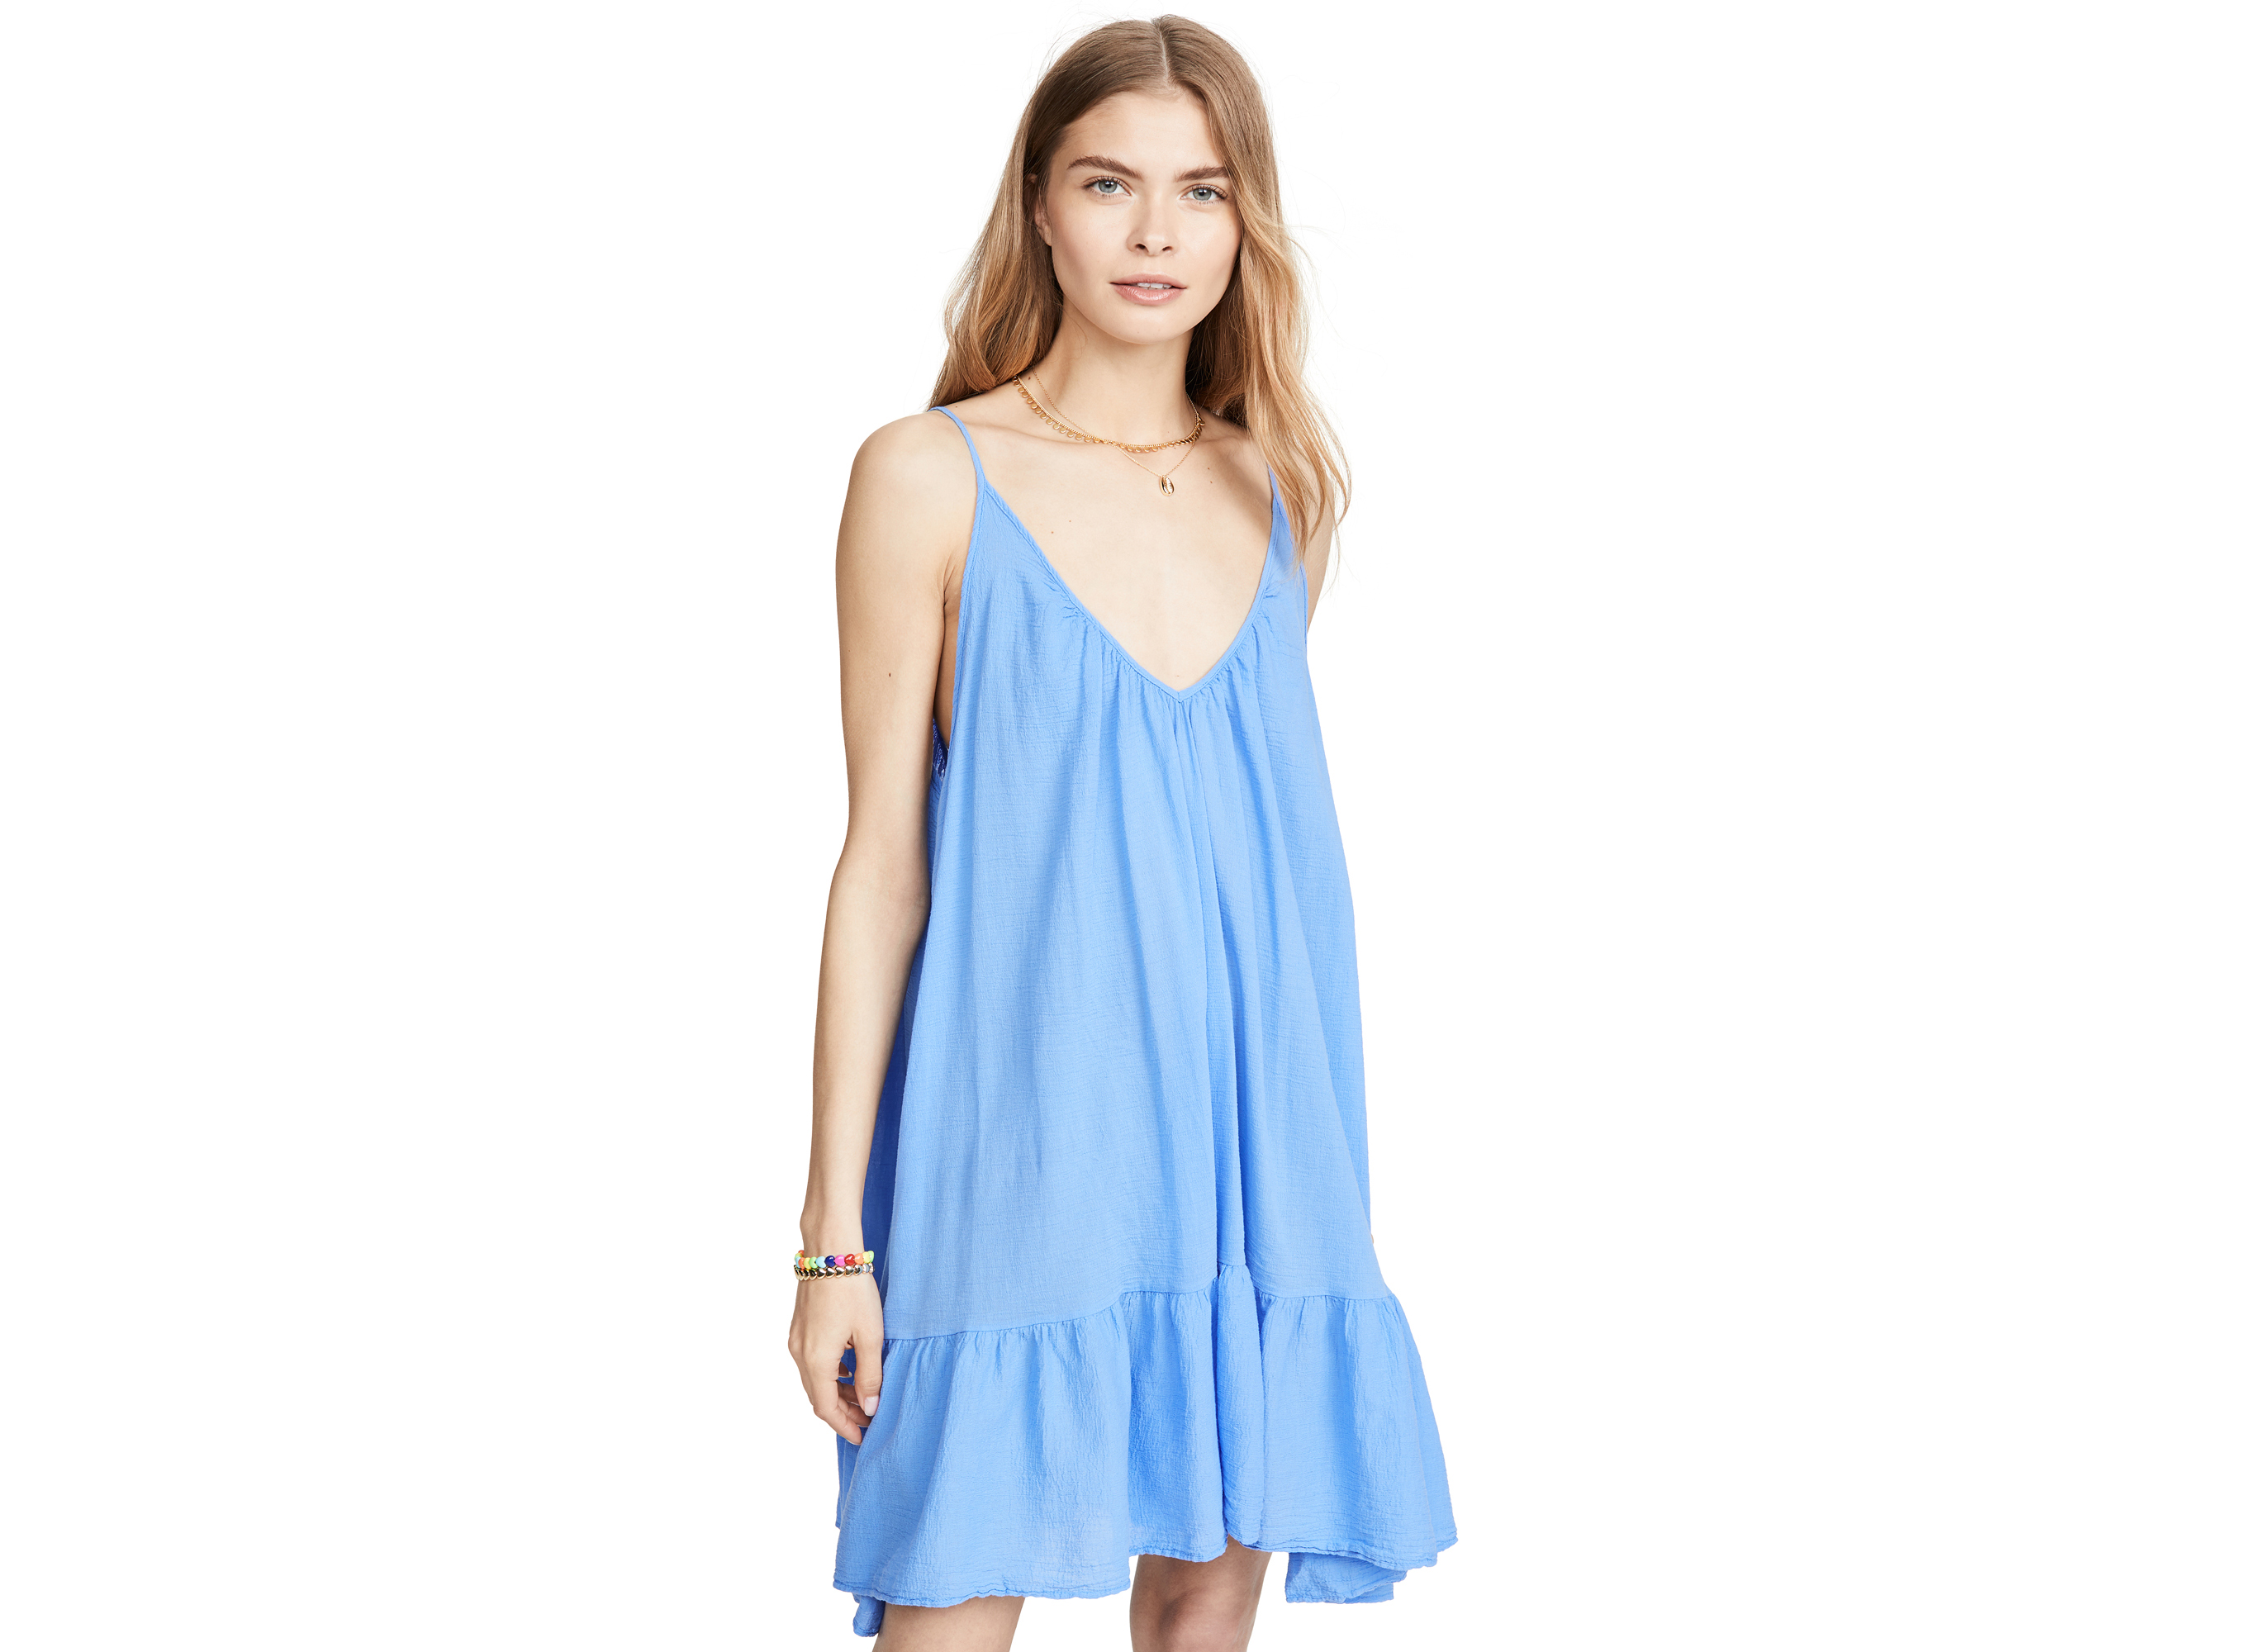 St. Tropez Mini Dress by 9seed